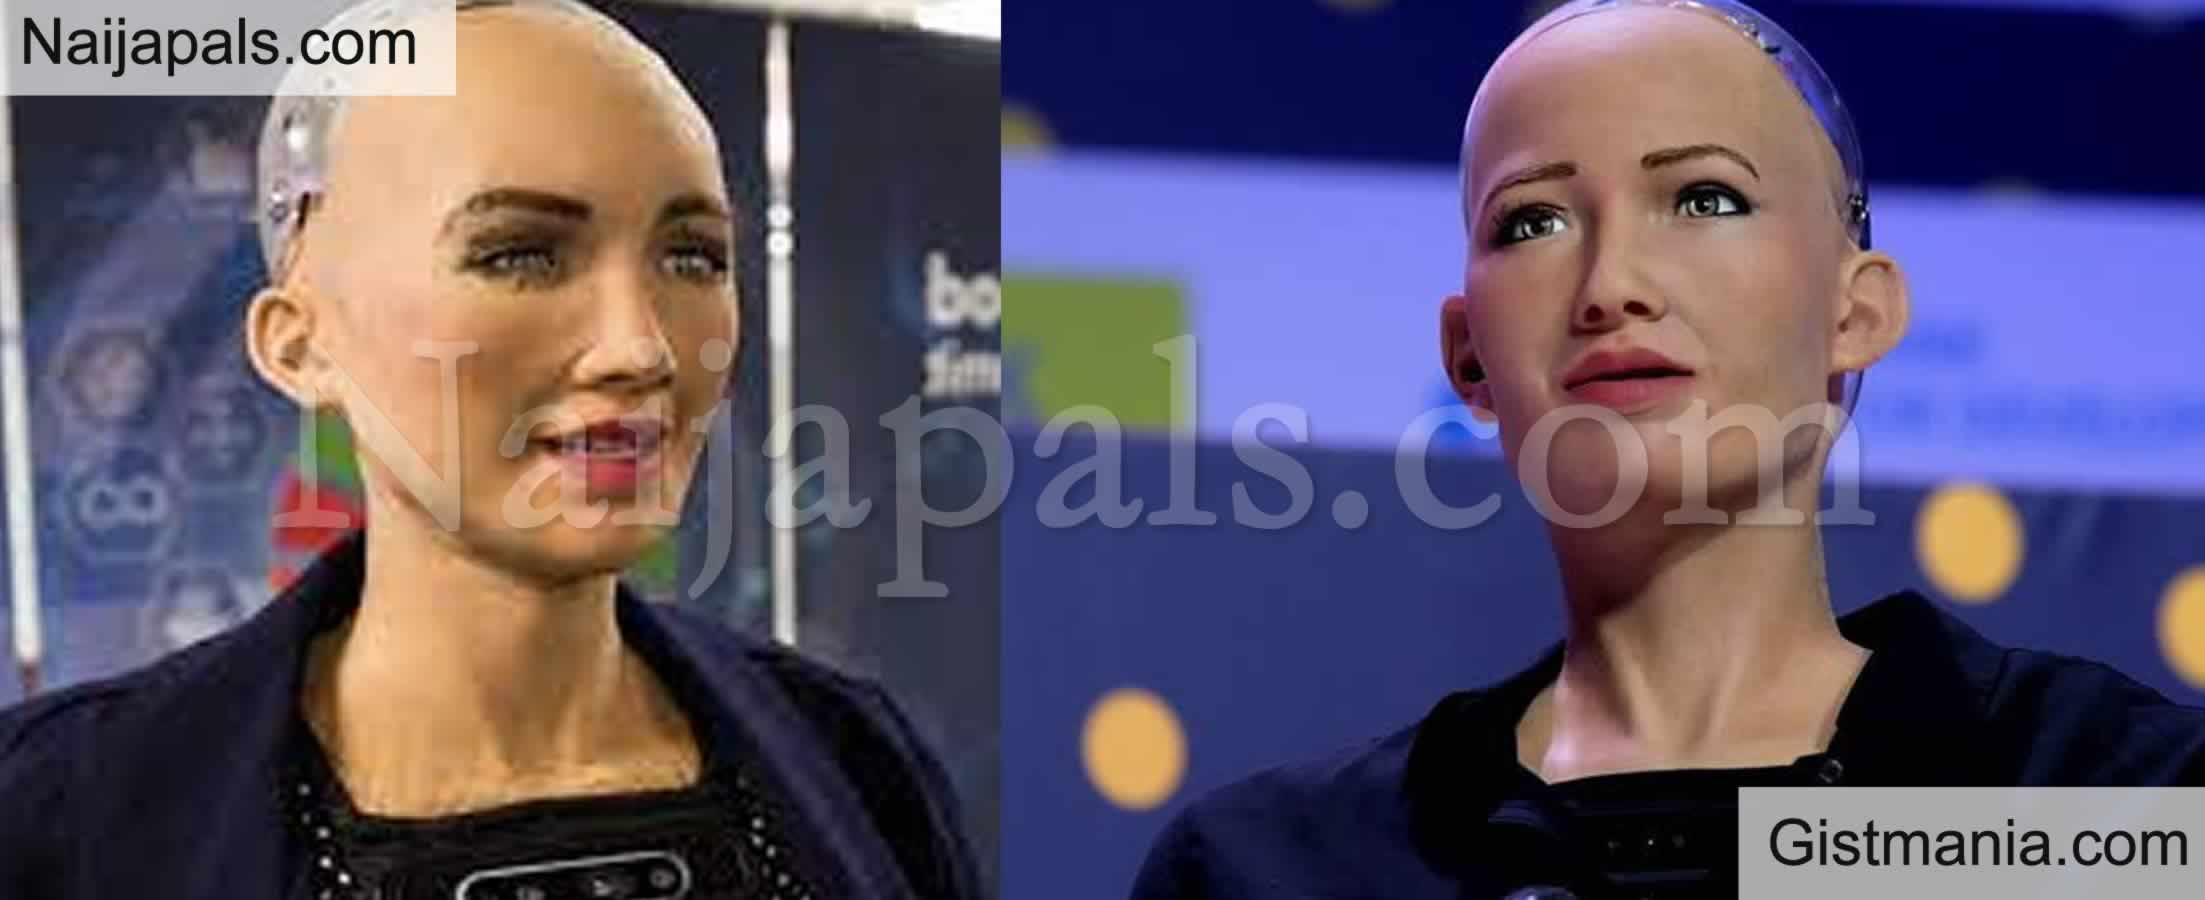 <img alt='.' class='lazyload' data-src='https://img.gistmania.com/emot/video.gif' /> <b>Meet Sophia, The First Robot Declared a Citizen by Saudi Arabia</b> (Video)